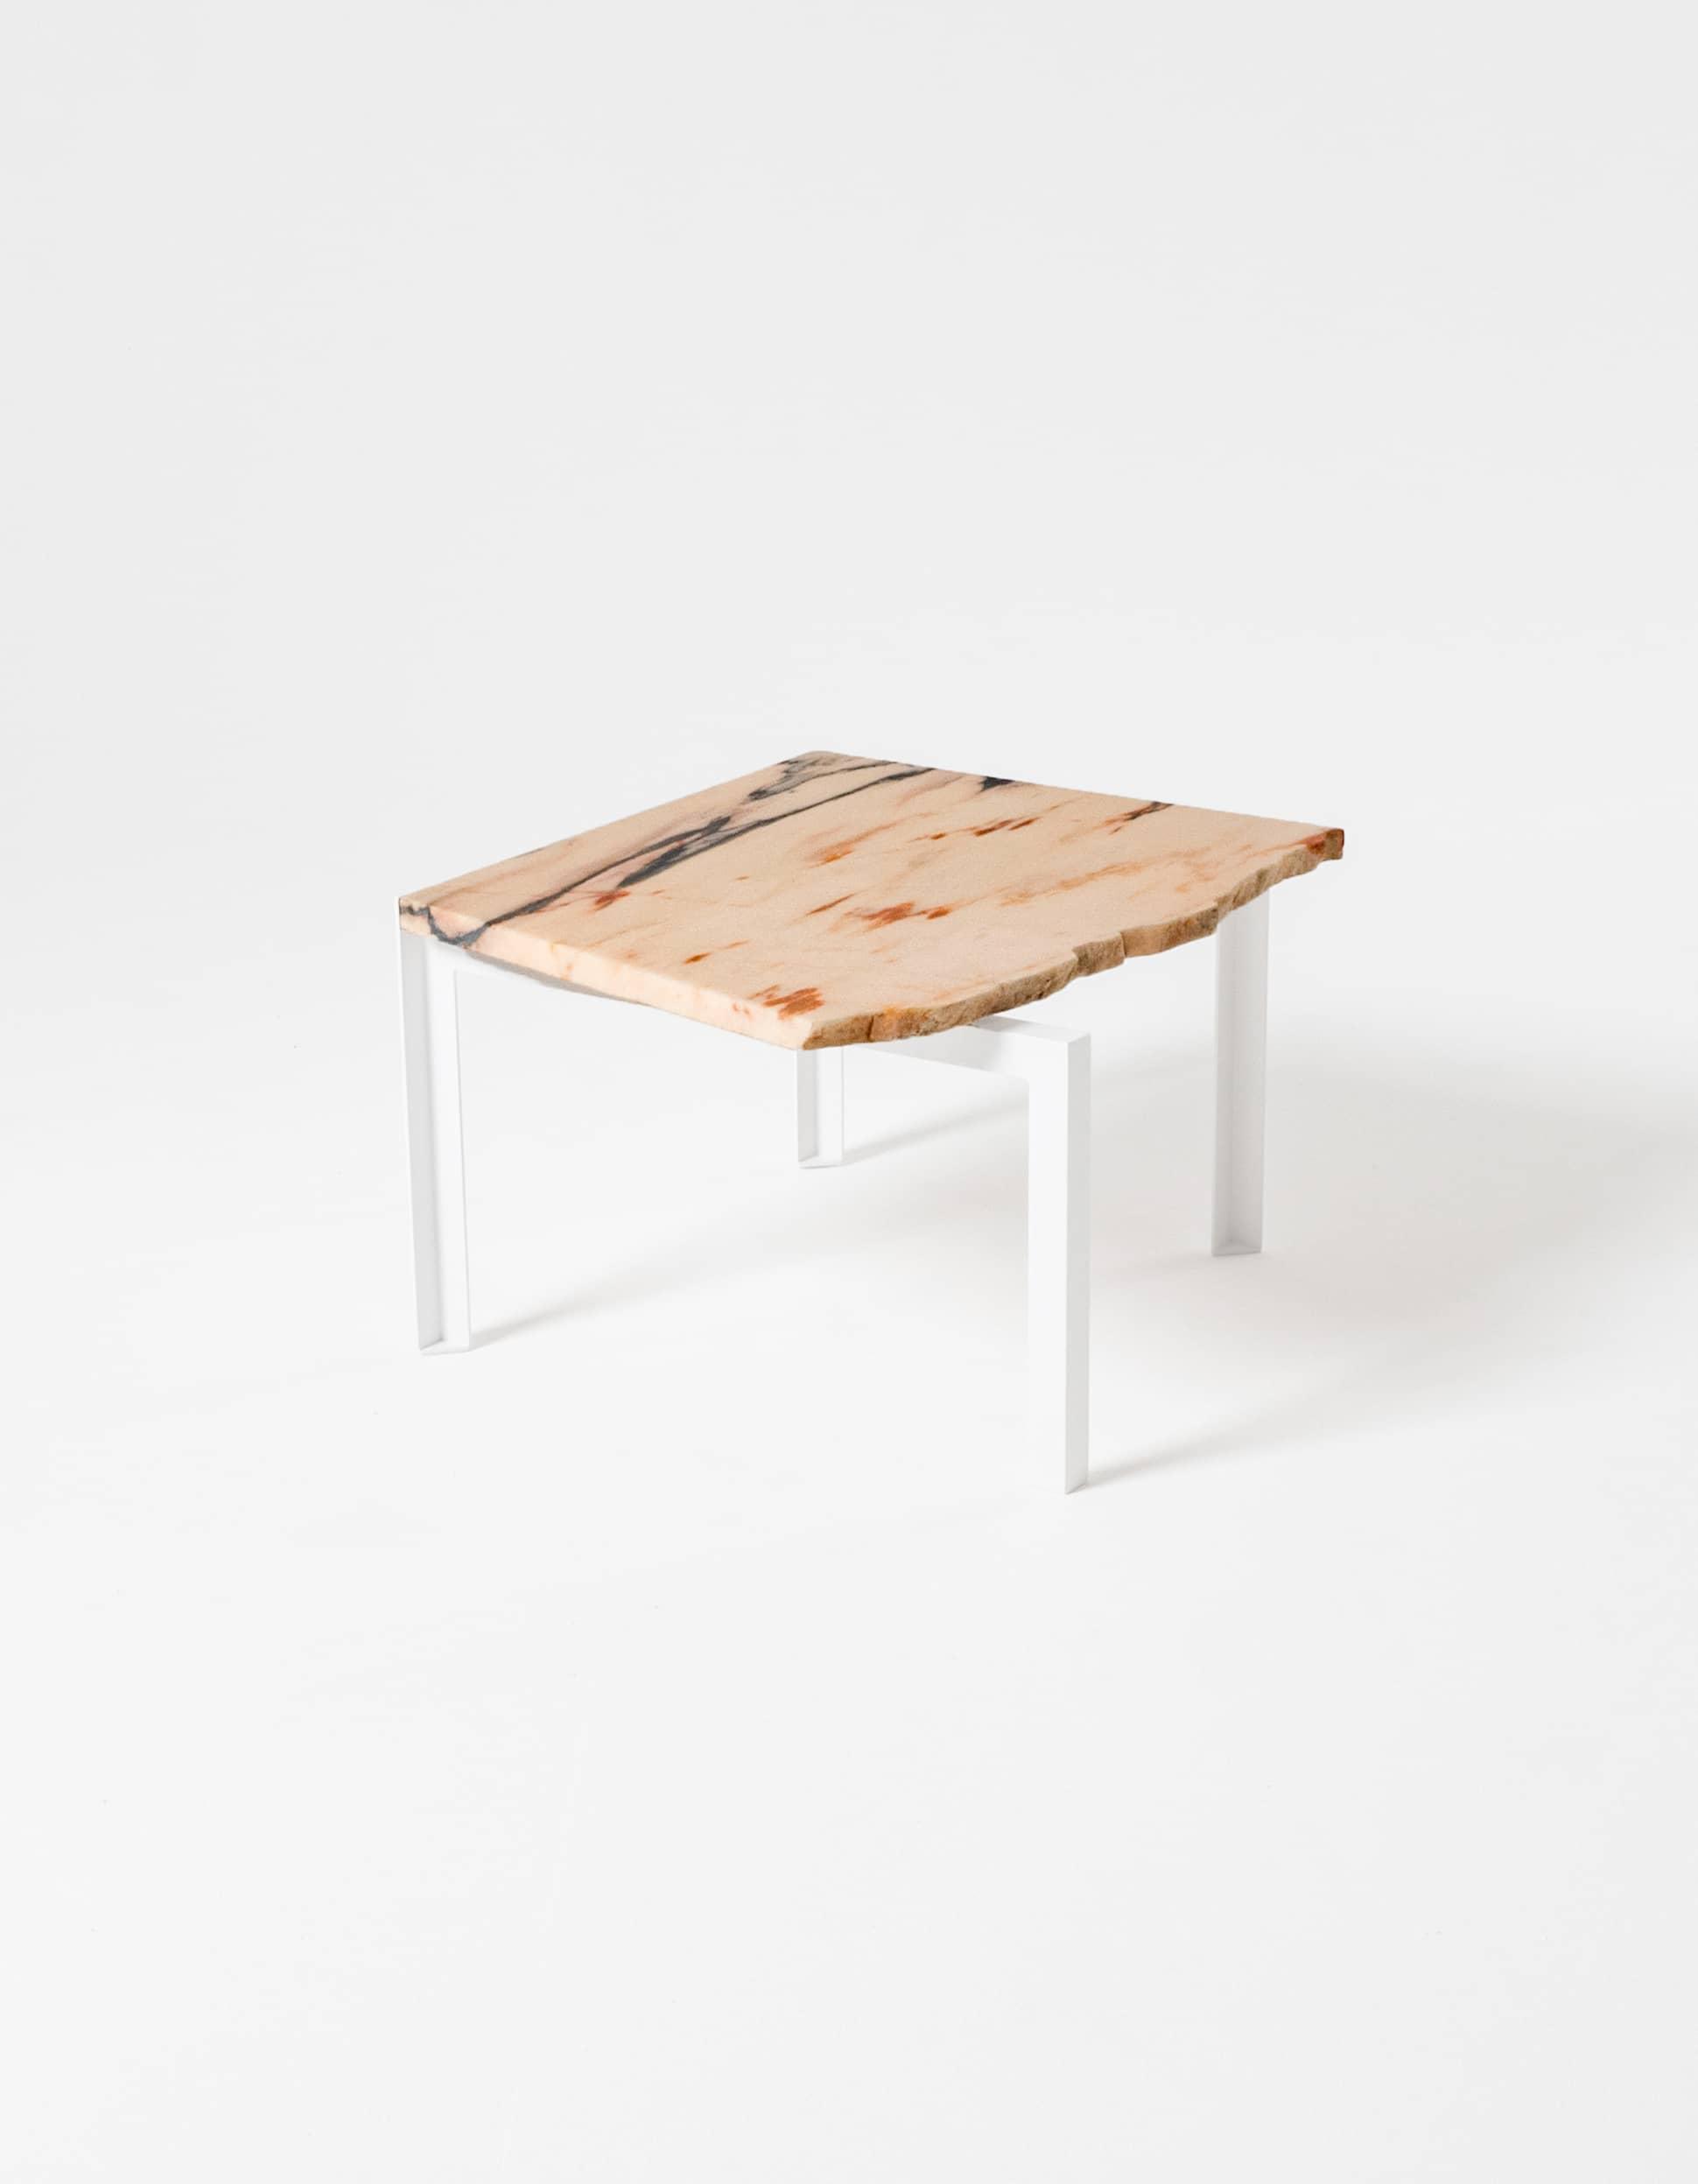 petite table d'angle-atelierhaussmann-